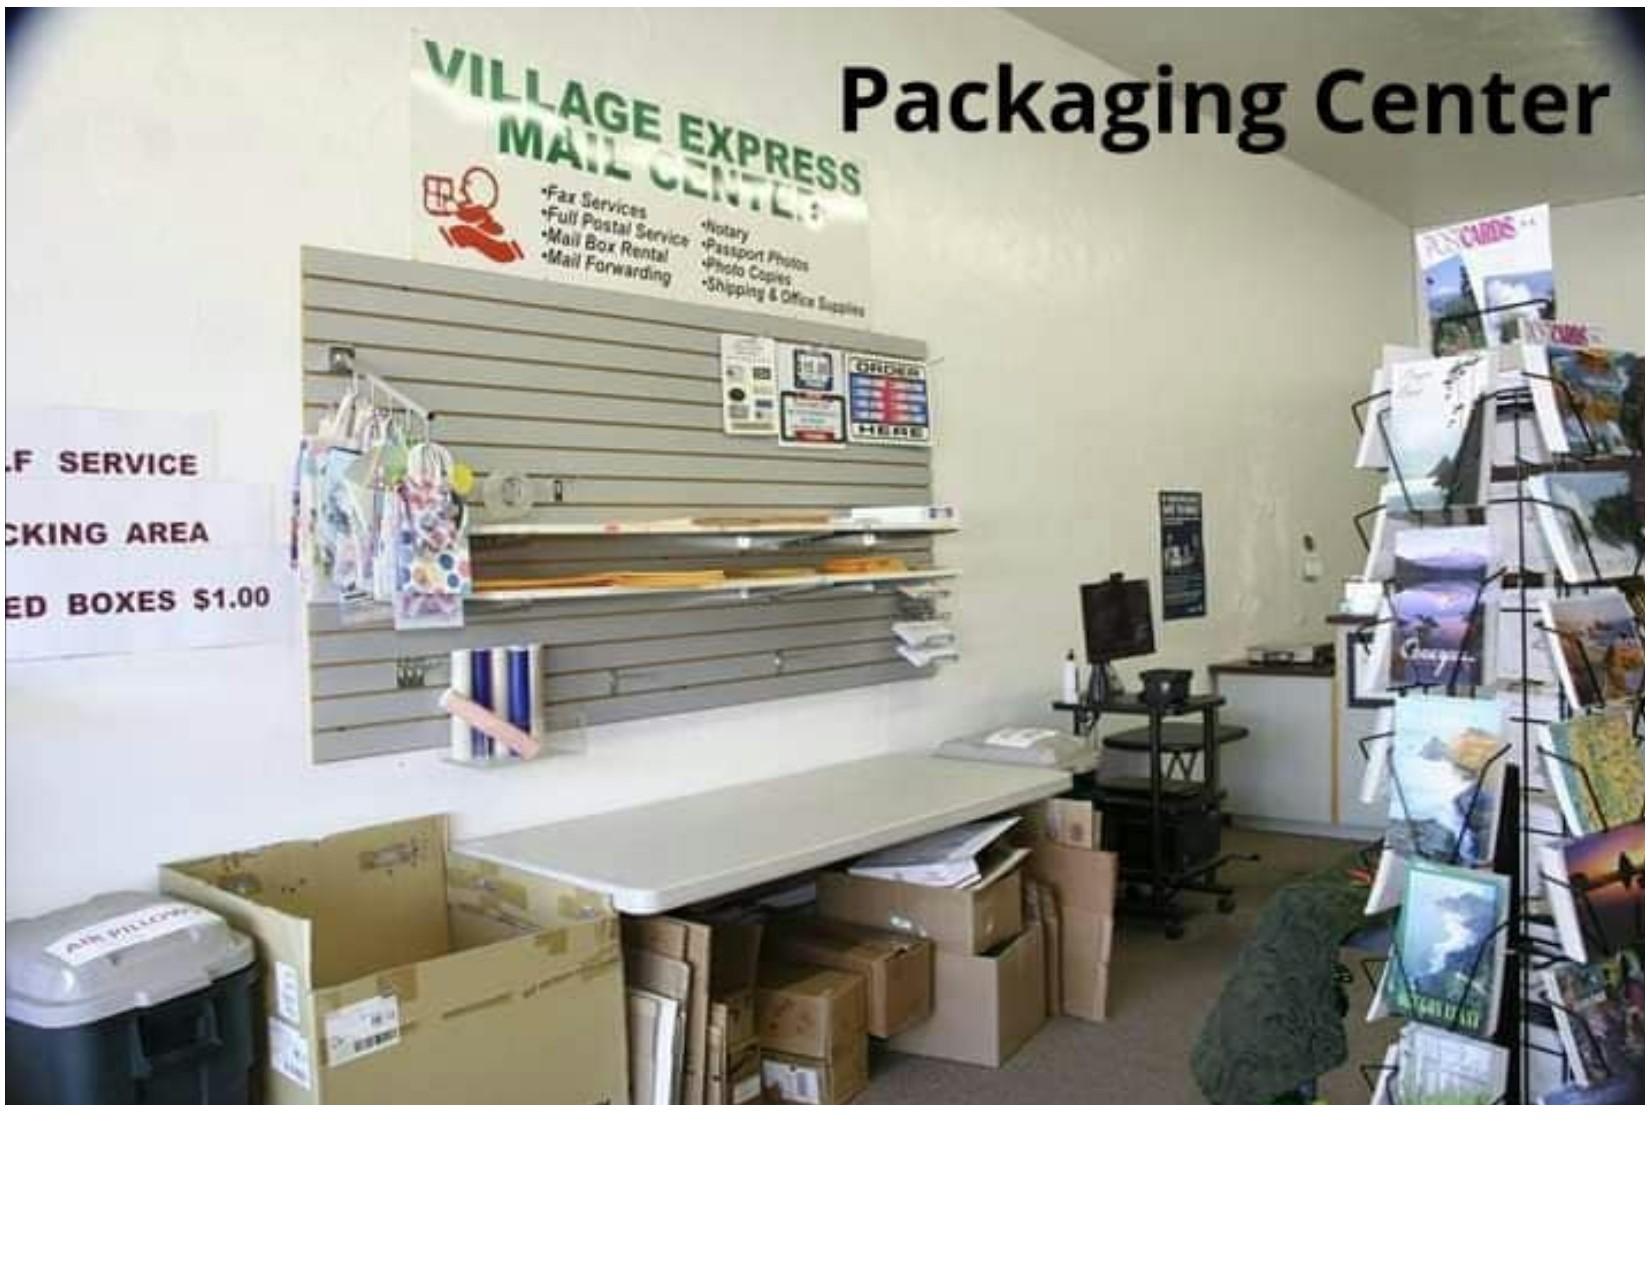 Village Mail Express packaging center.jpg